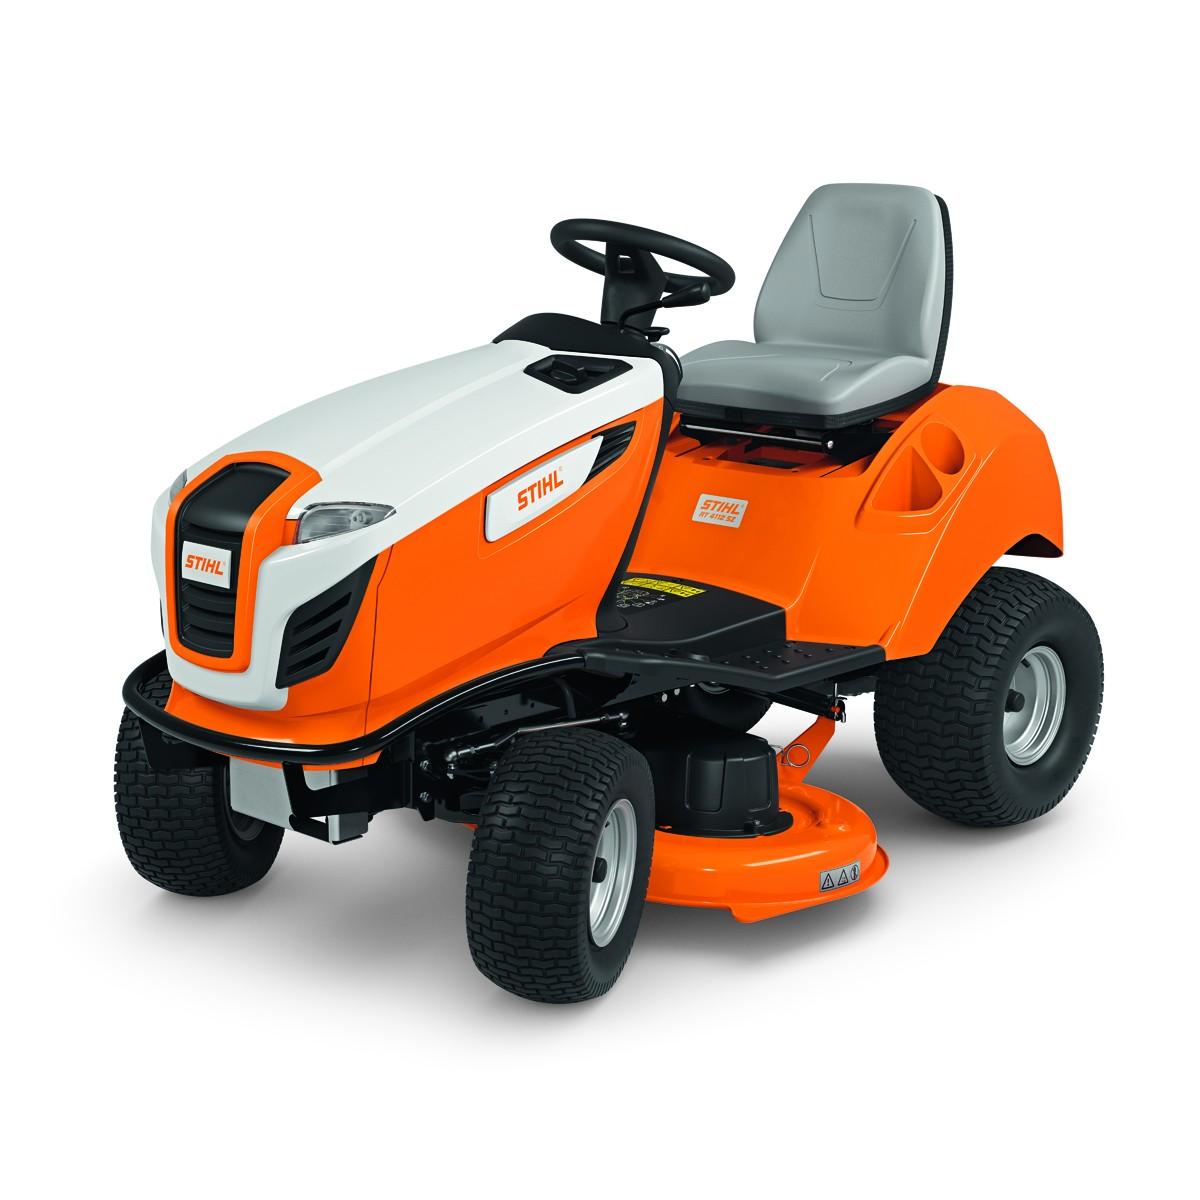 Vejos pjovimo traktorius STIHL RT 4112 SZ